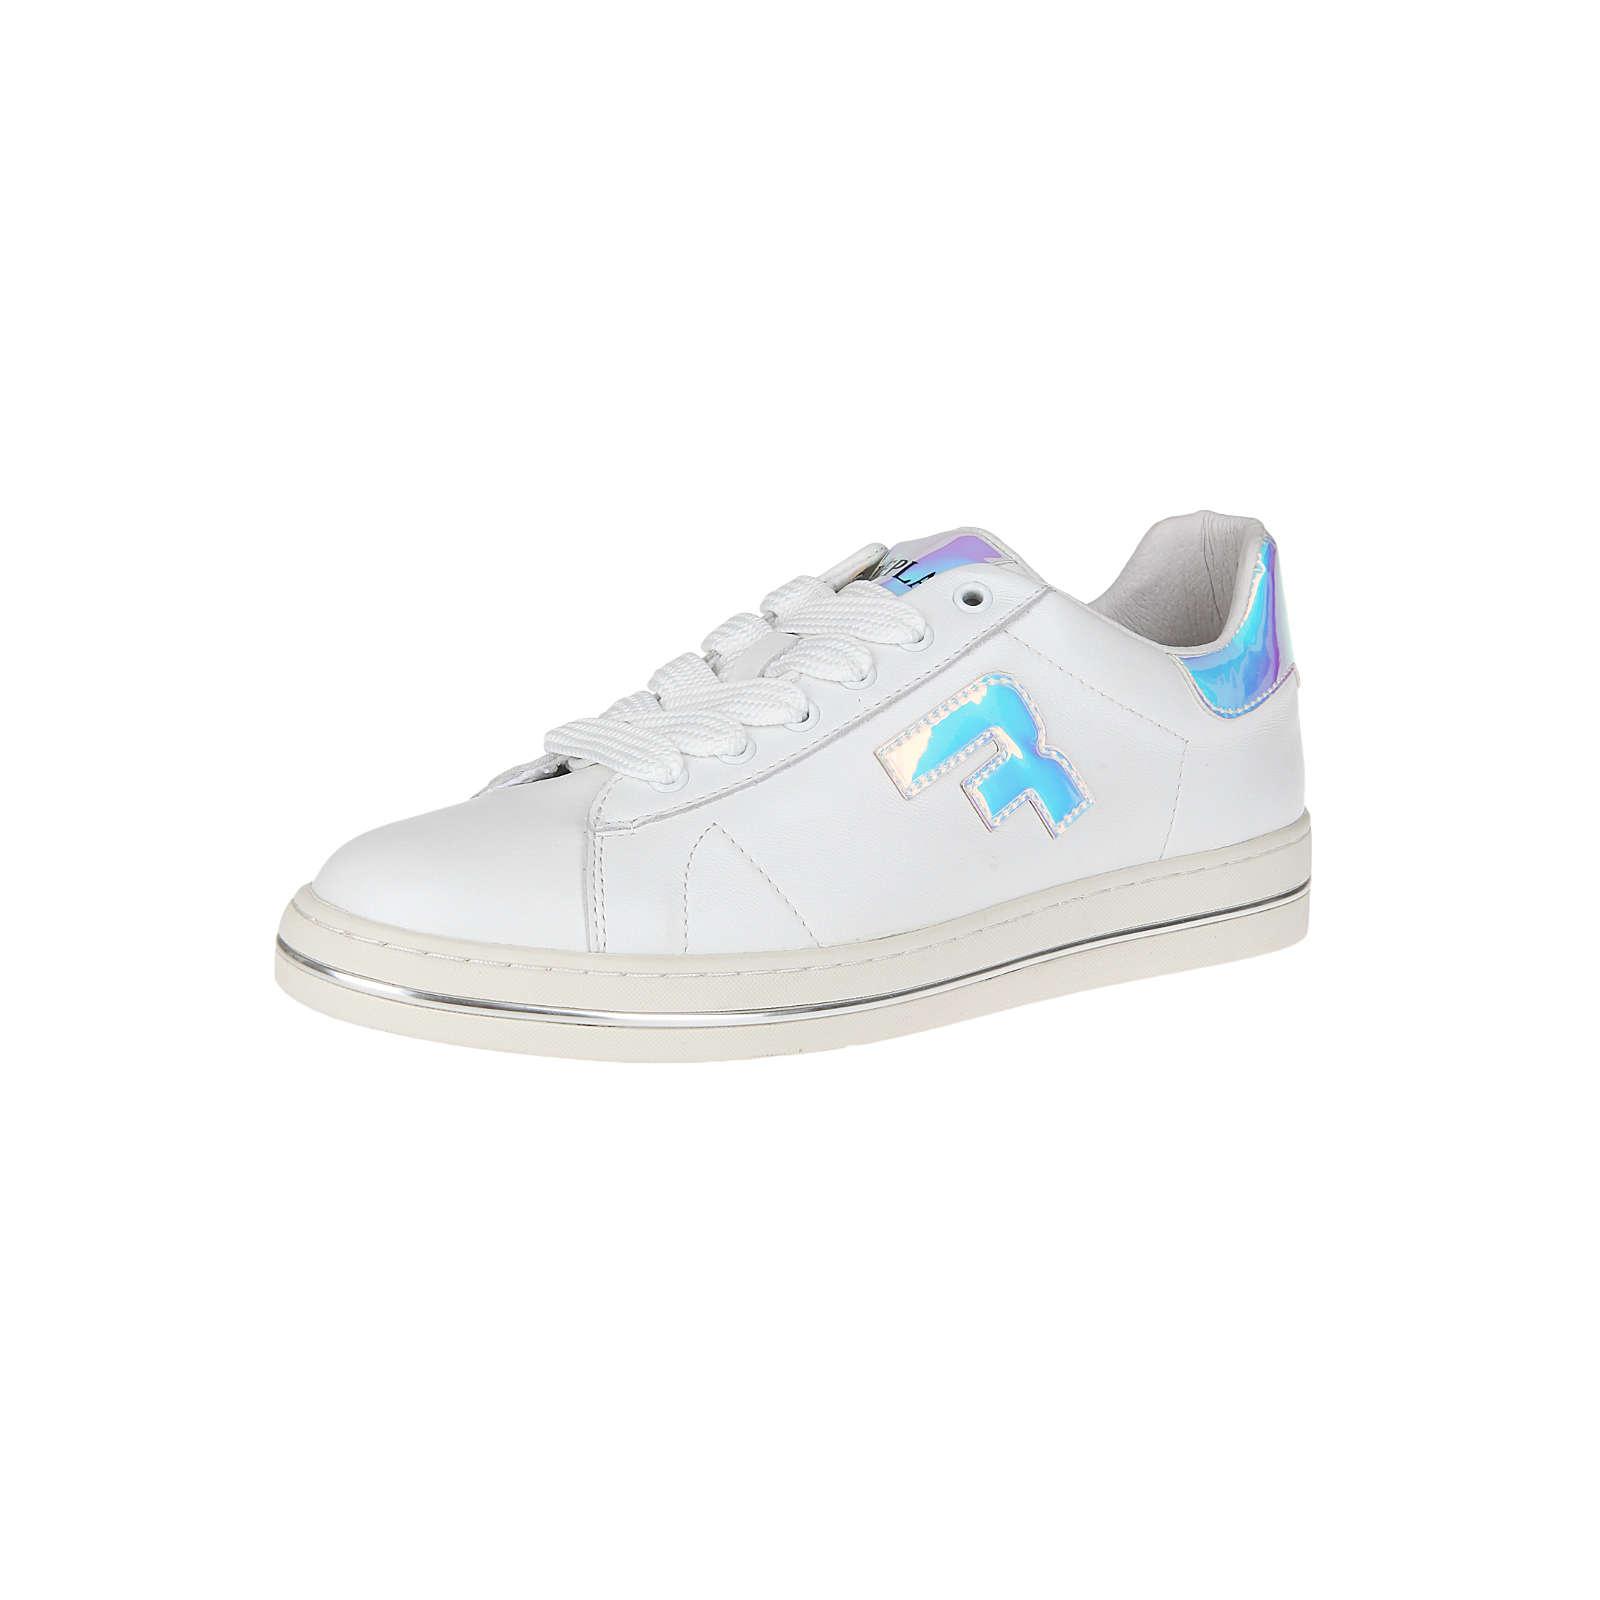 REPLAY Sneaker KET Sneakers Low weiß Damen Gr. 37